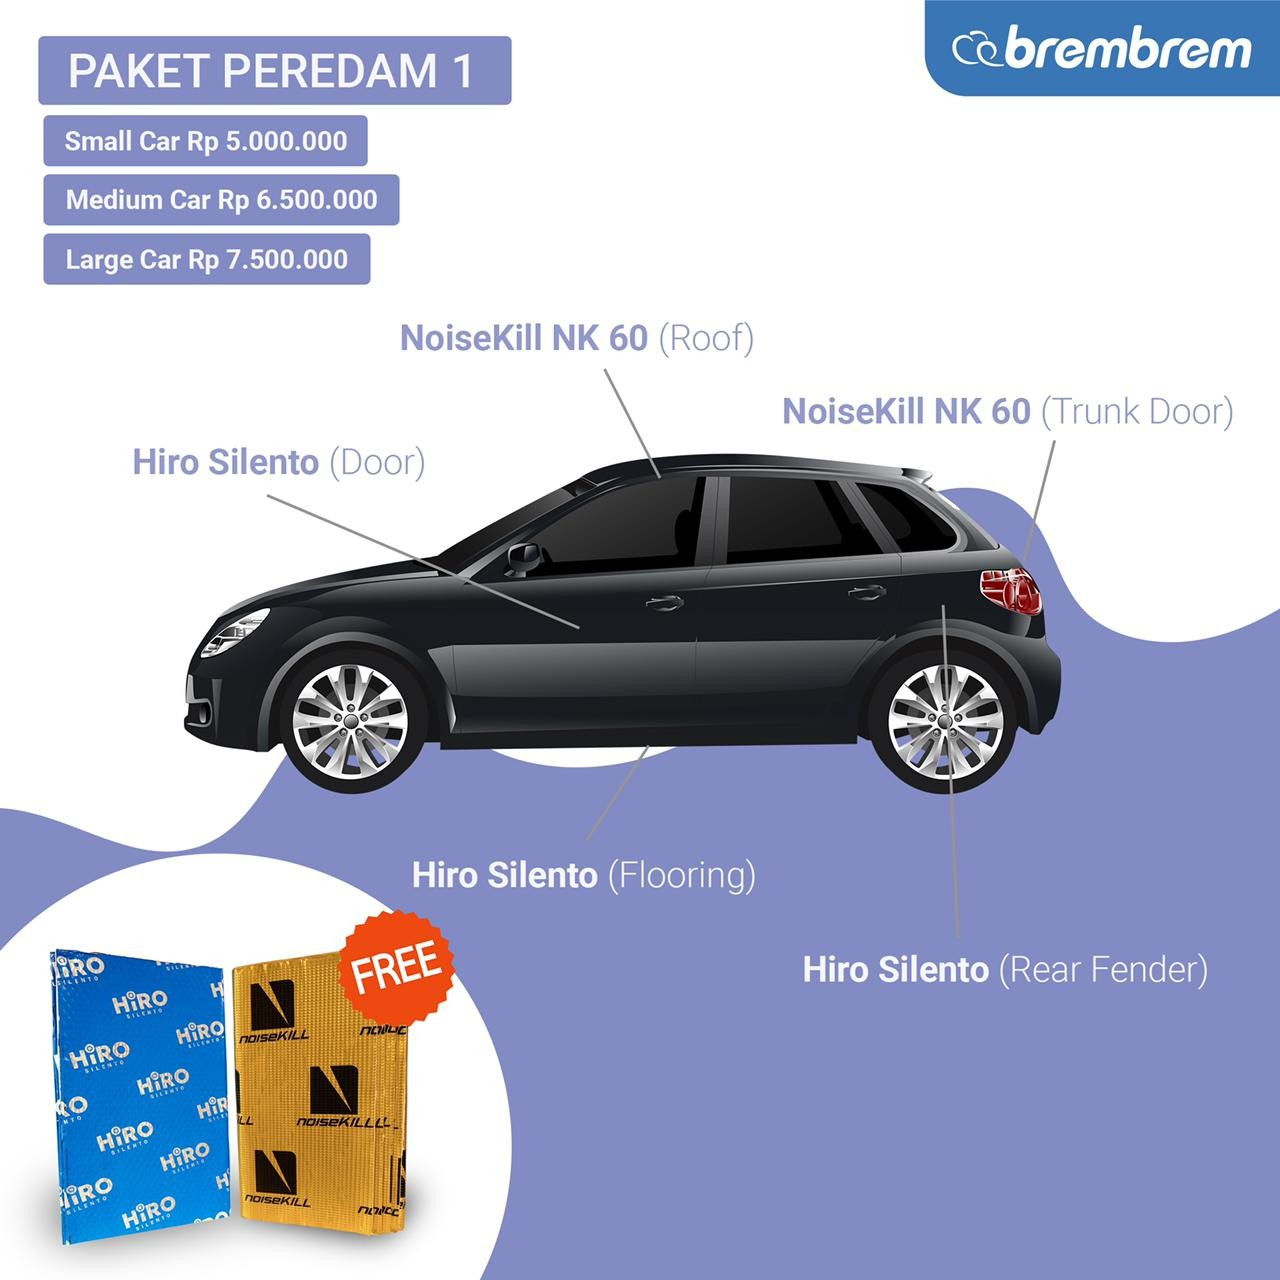 PAKET PEREDAM 1 - PROMO MENANG BANYAK - MEDIUM CAR